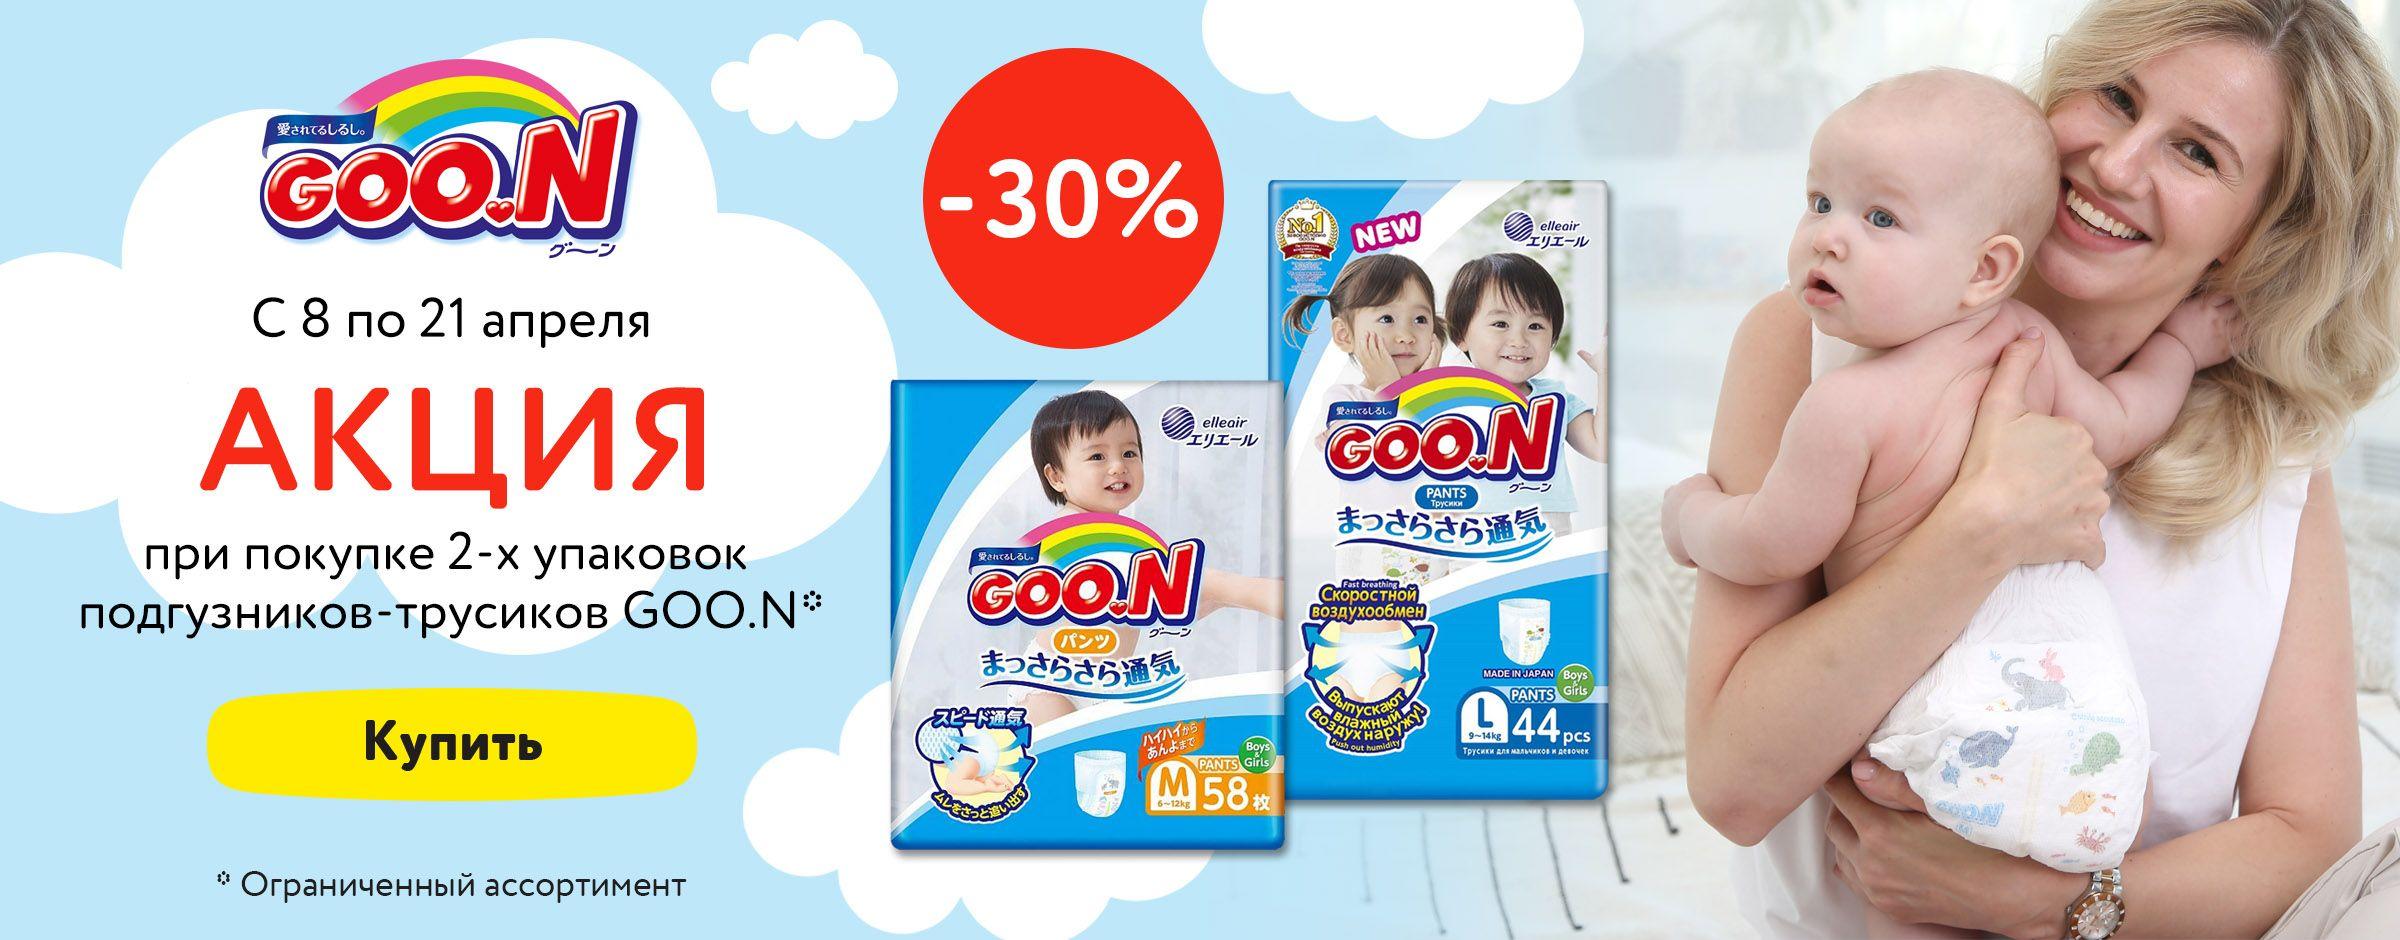 Доп 30% на 2 упаковки трусиков Goon статика